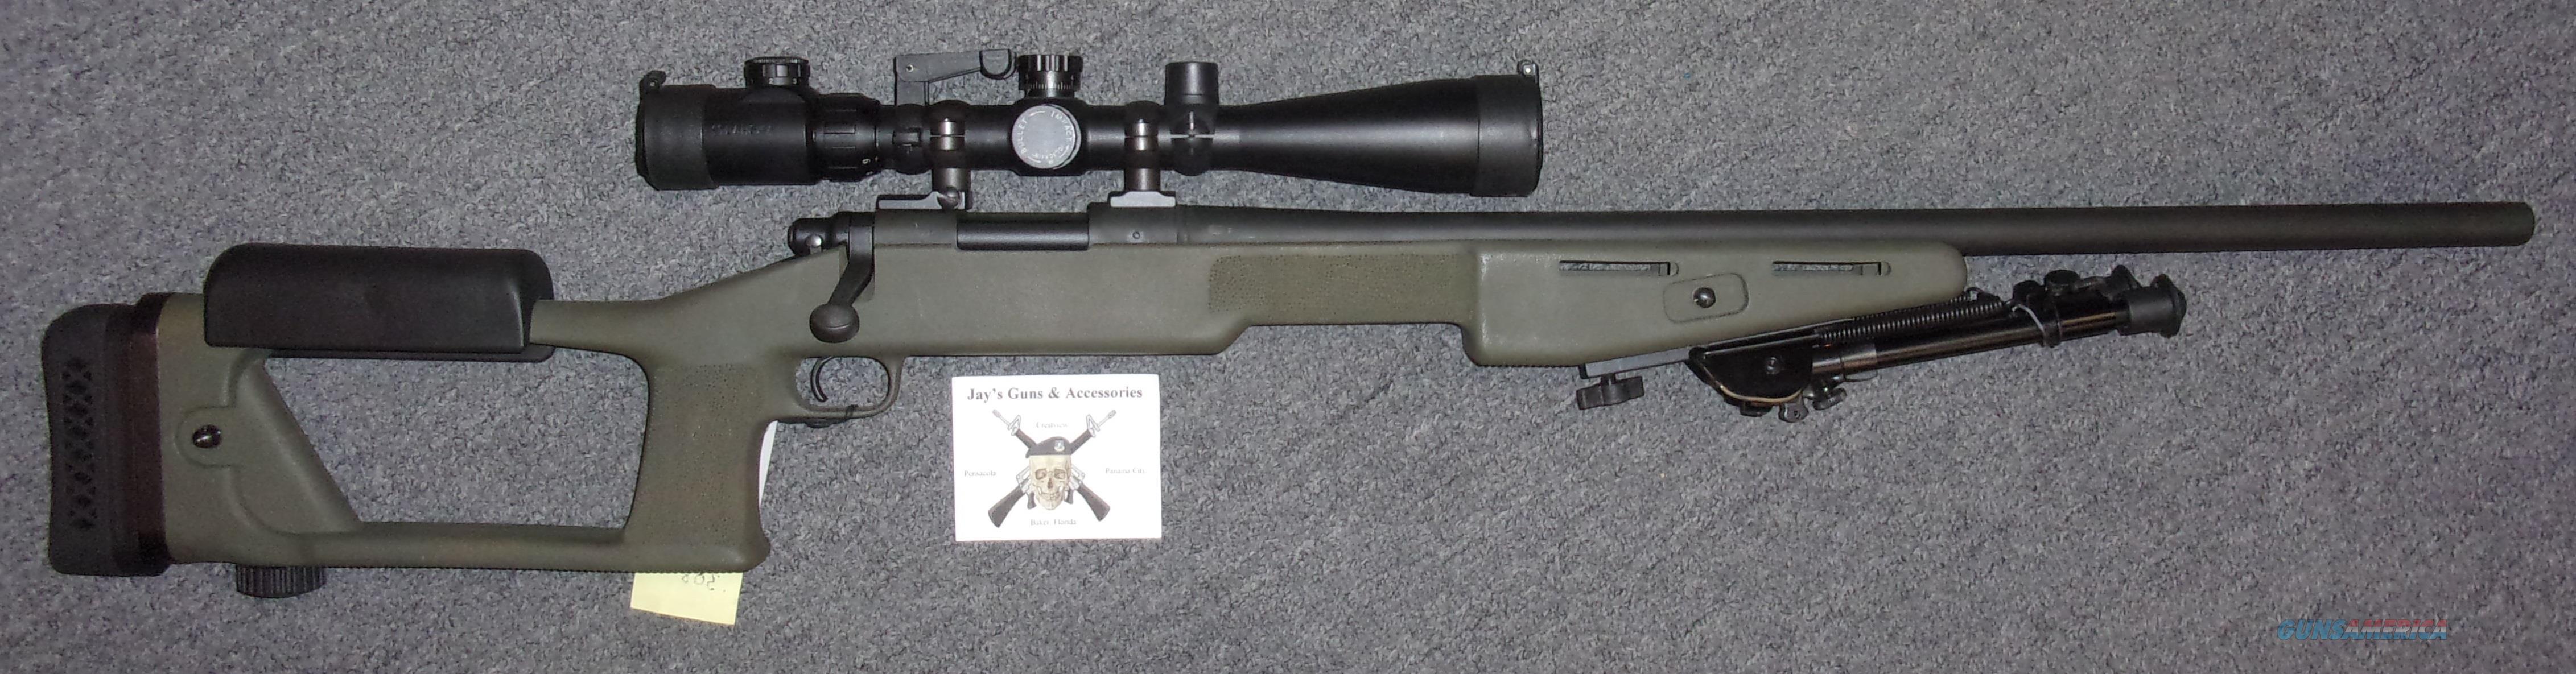 Remington 700 Police w/Scope & Kit  Guns > Rifles > Remington Rifles - Modern > Model 700 > Tactical